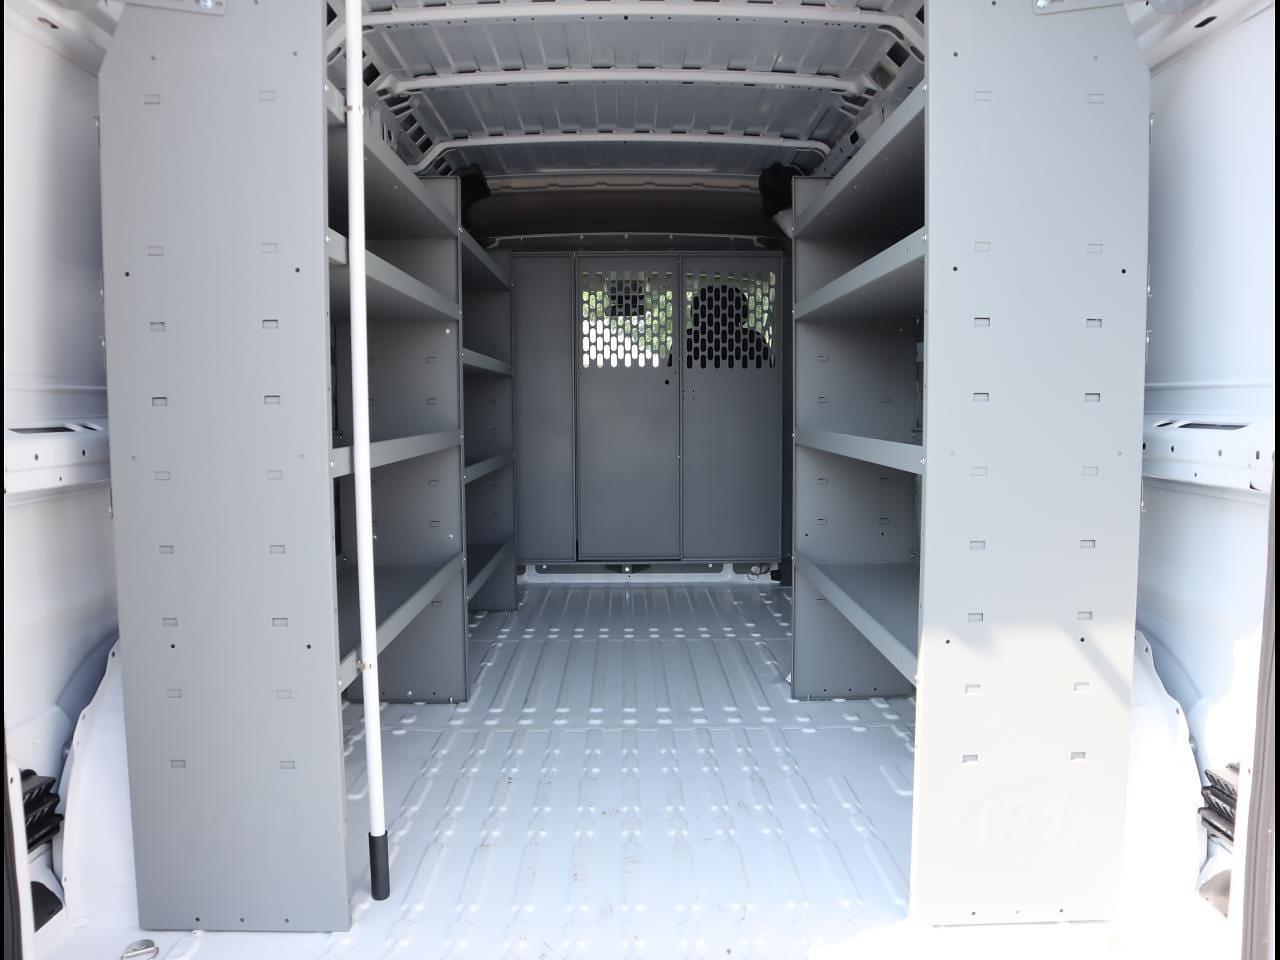 2021 Ram ProMaster 2500 High Roof FWD, Upfitted Cargo Van #RR21559 - photo 1